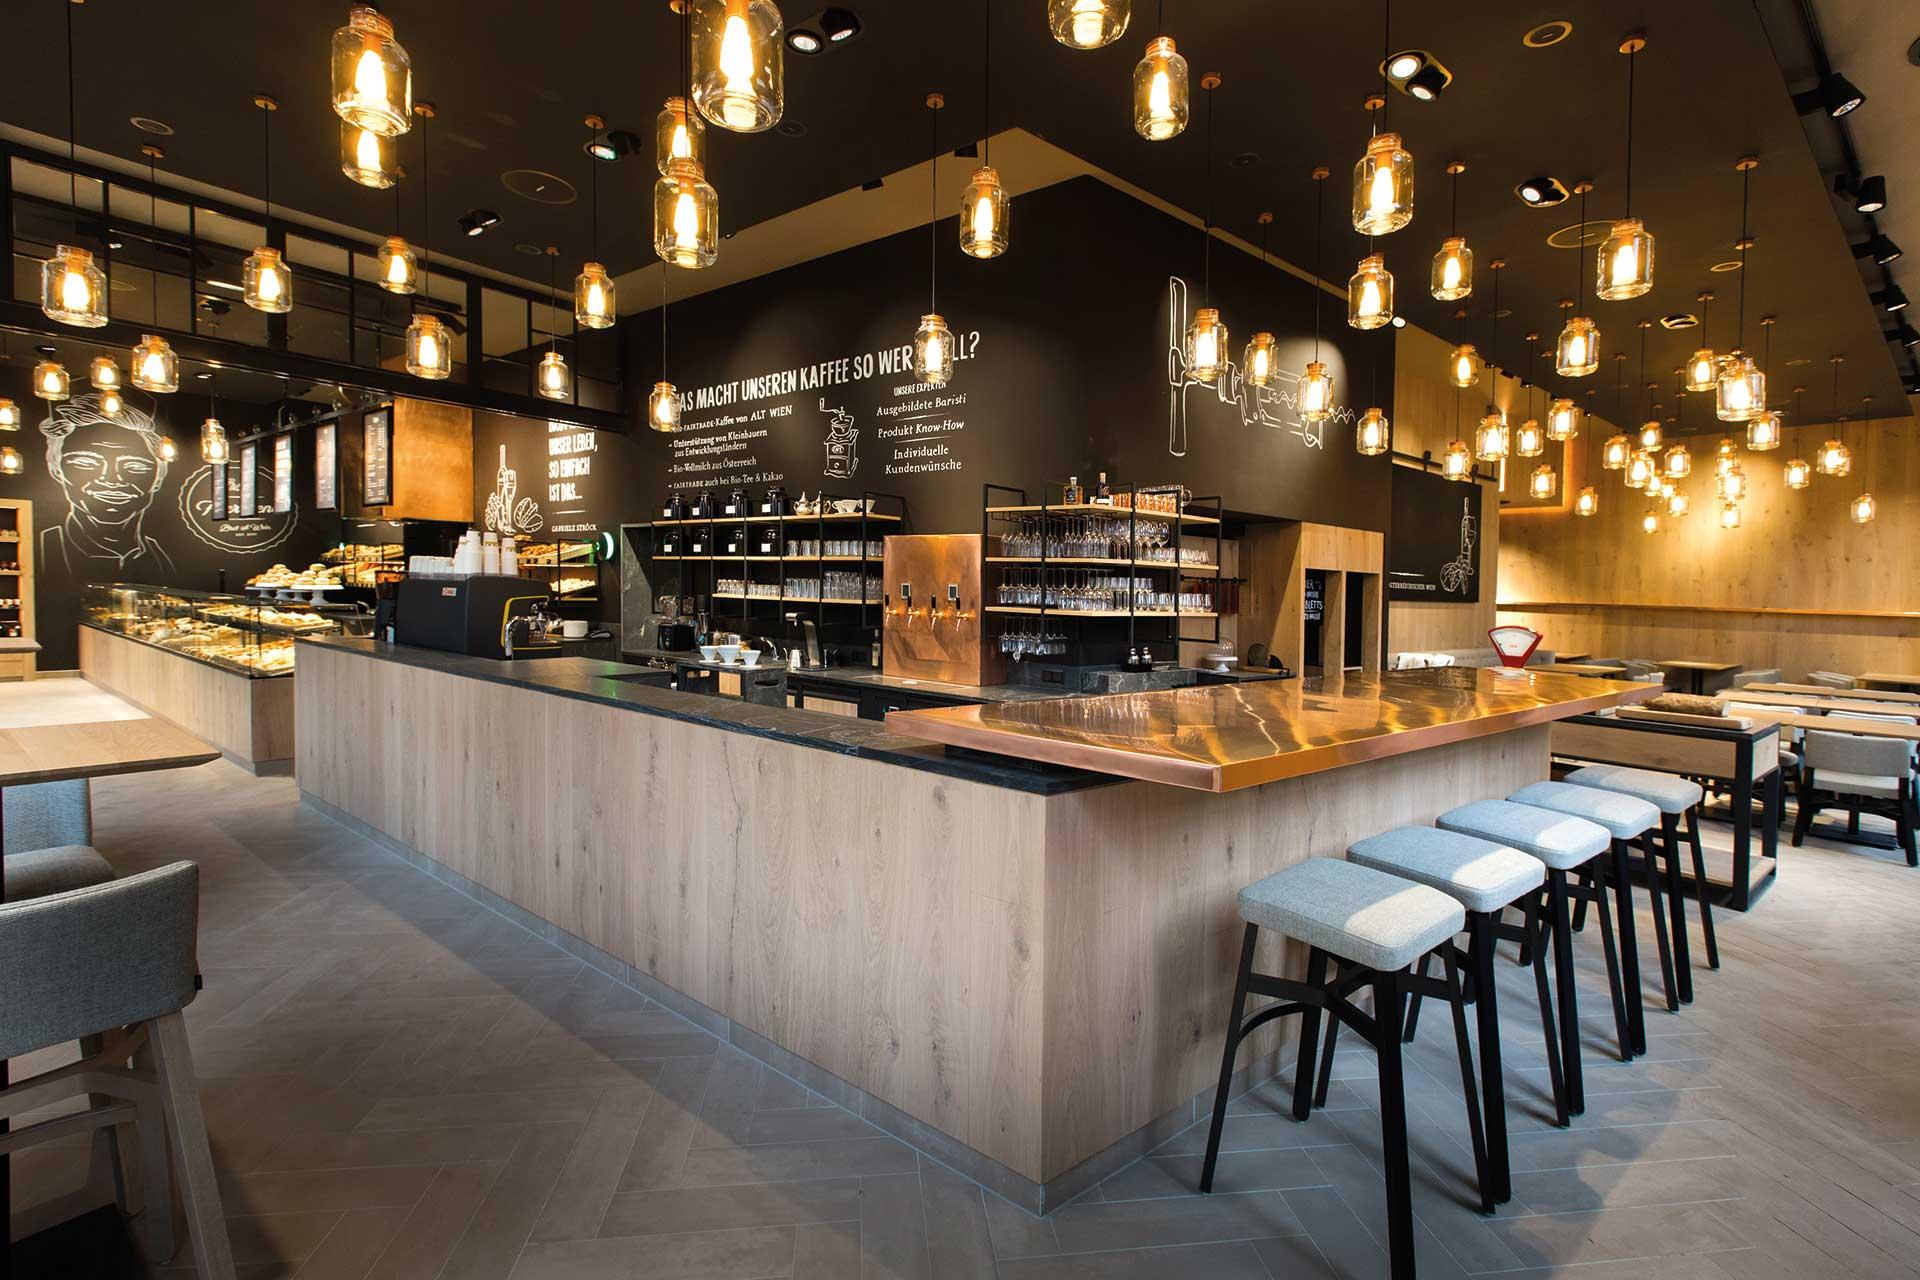 Cafe Lukas Essen